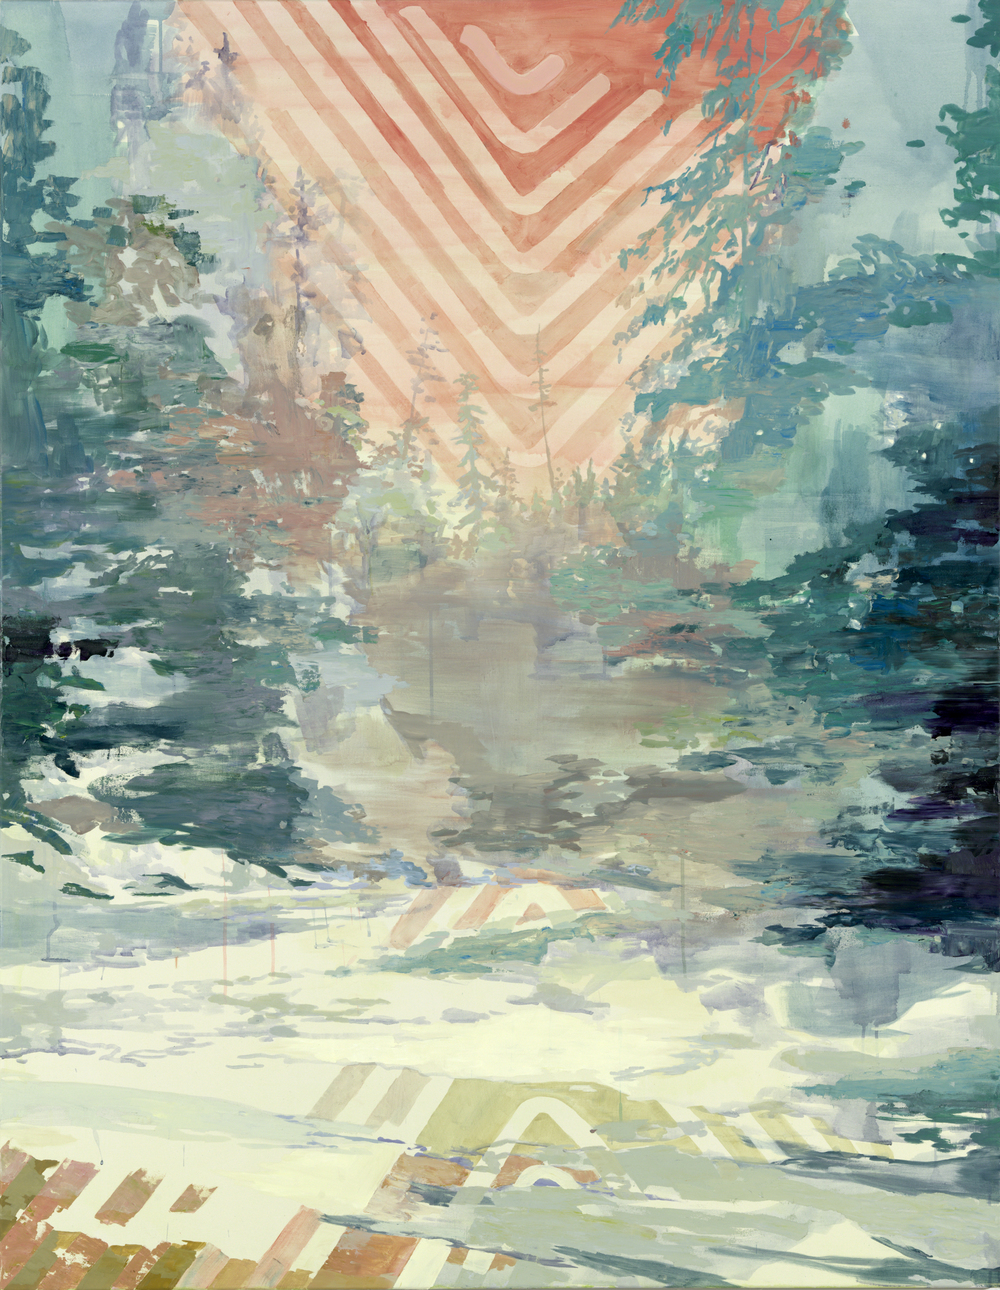 Set, 2011, 180 x 140 cm, oil on canvas